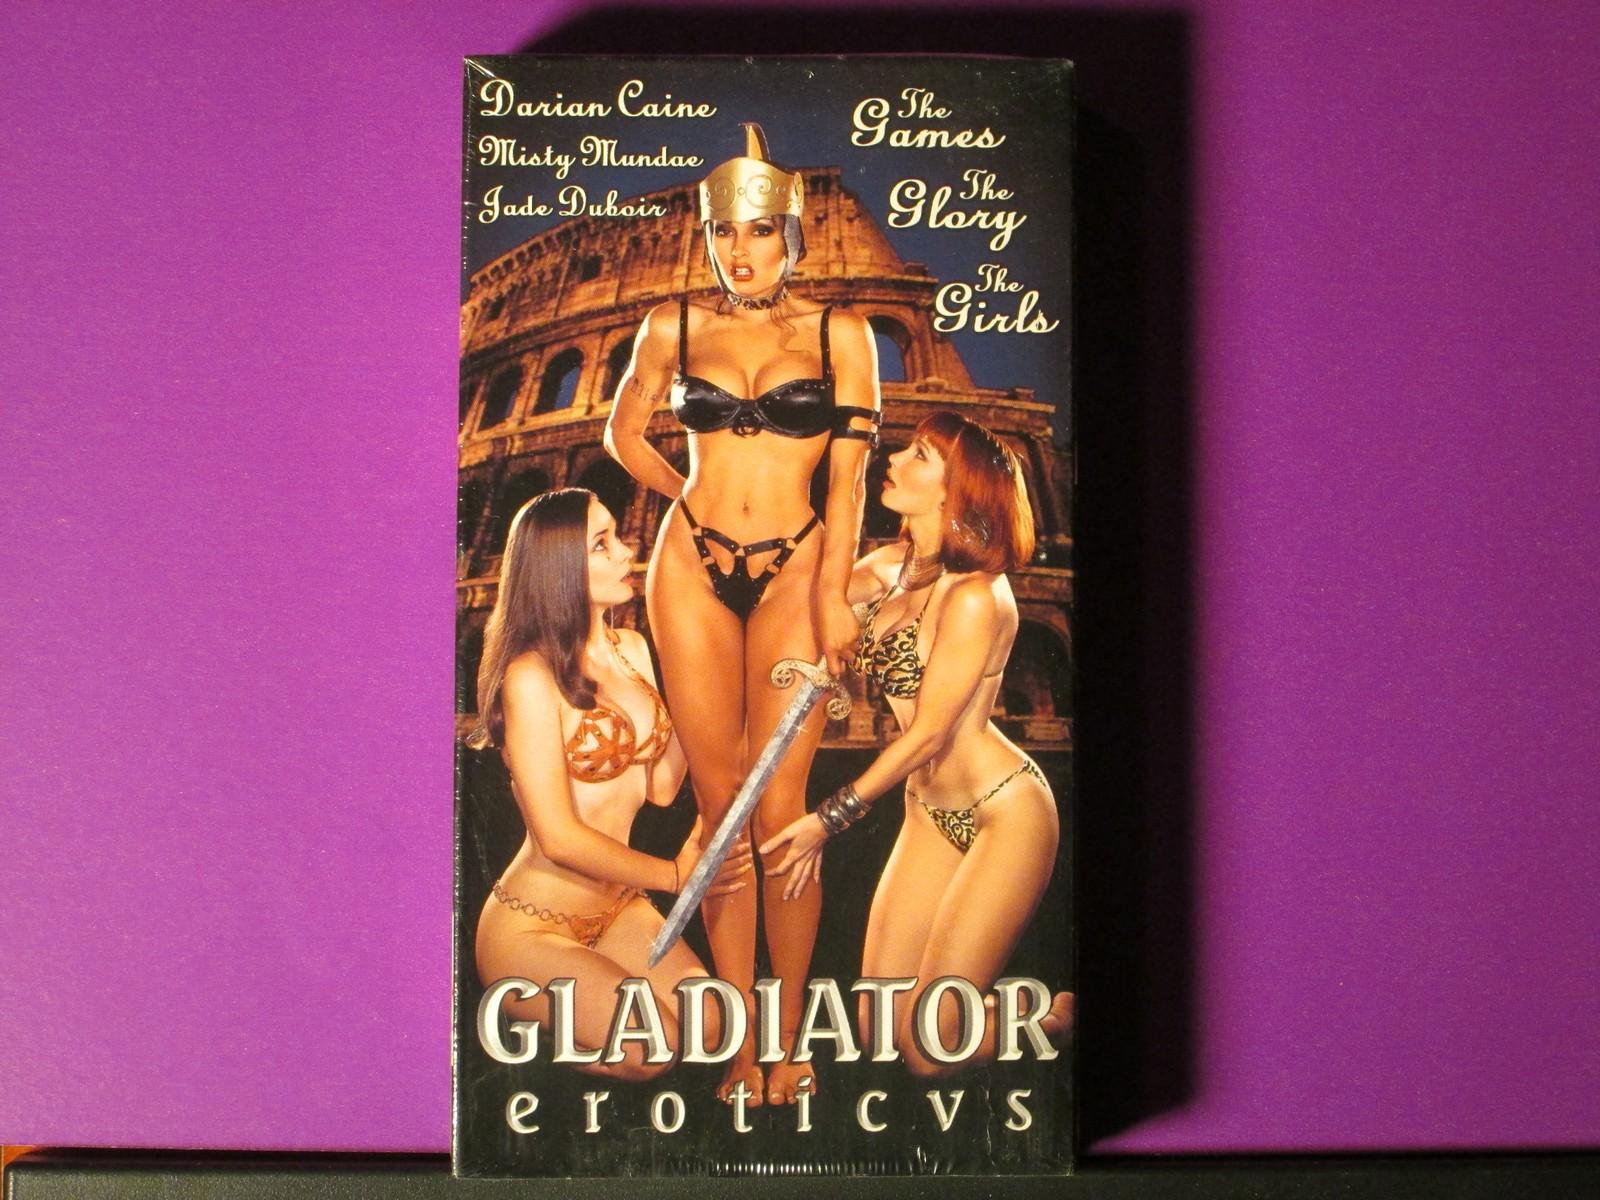 Gladitor Eroticvs - Darian Kane - Misty Mundae - Sweet N Evil